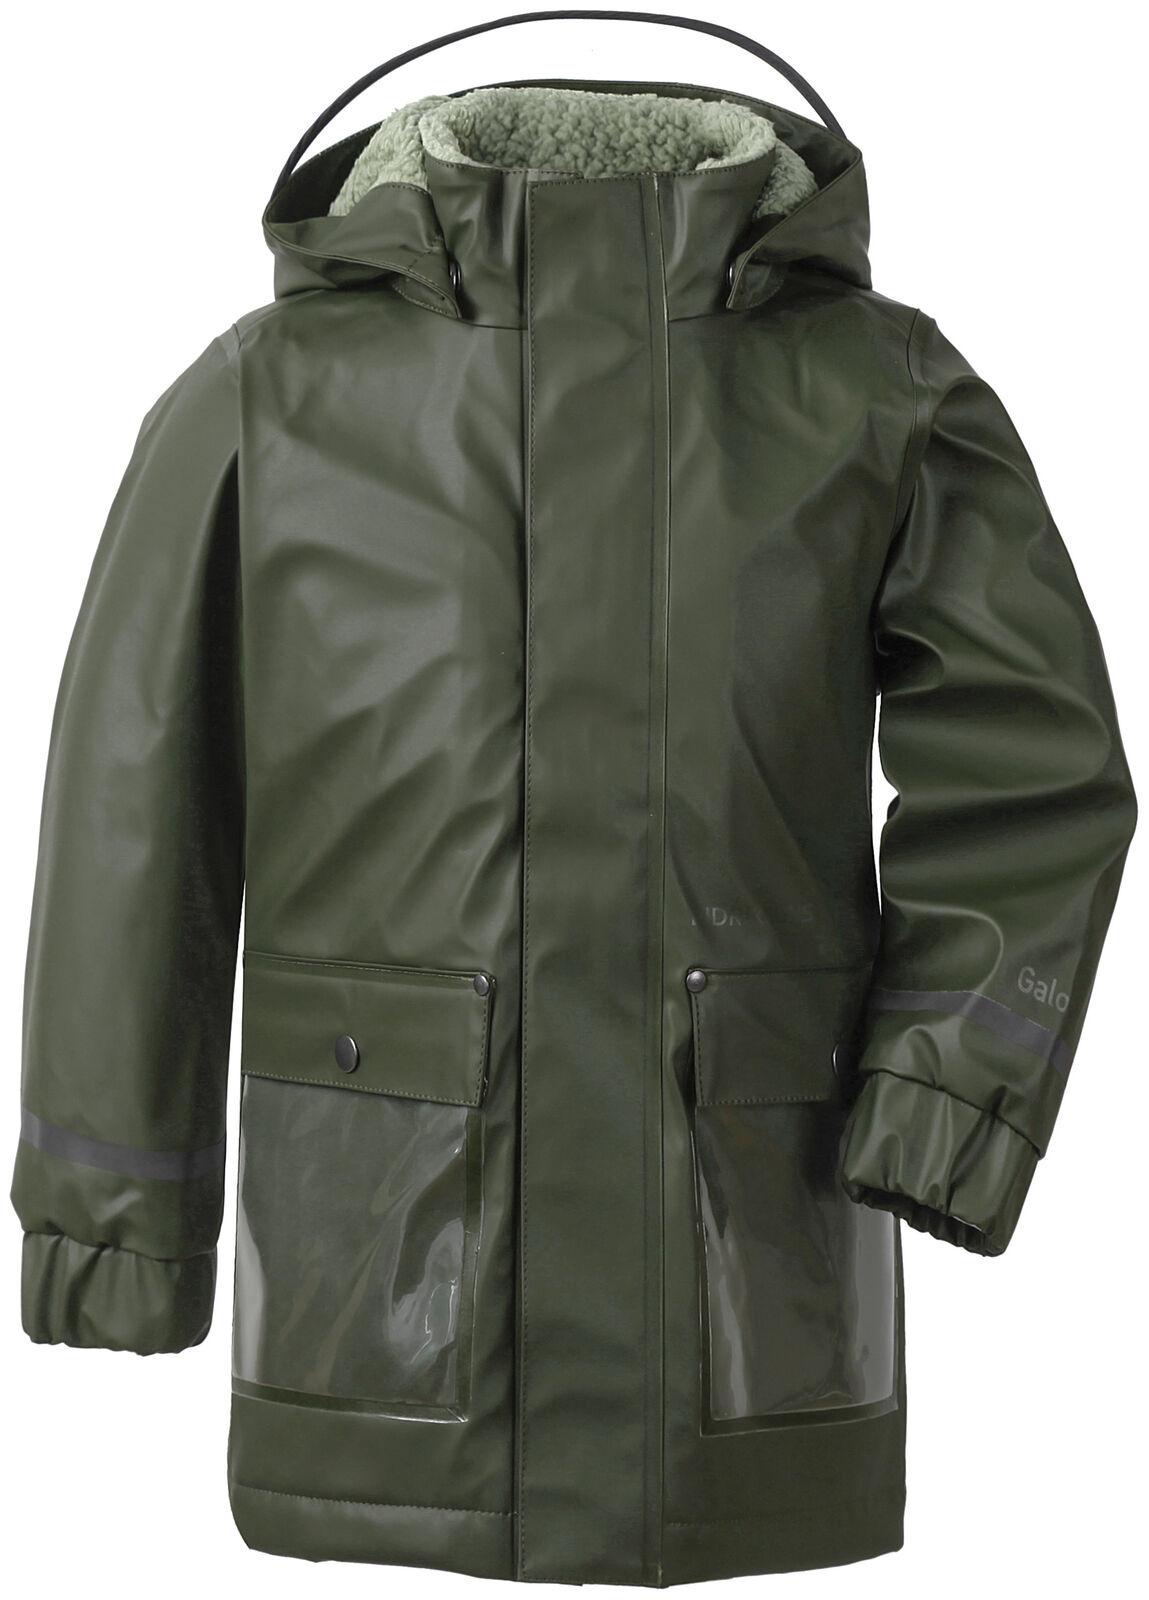 Didriksons Outdoorjacke Adventurejacke Ekholm Kid's Coat 2 dunkelgrün winddicht